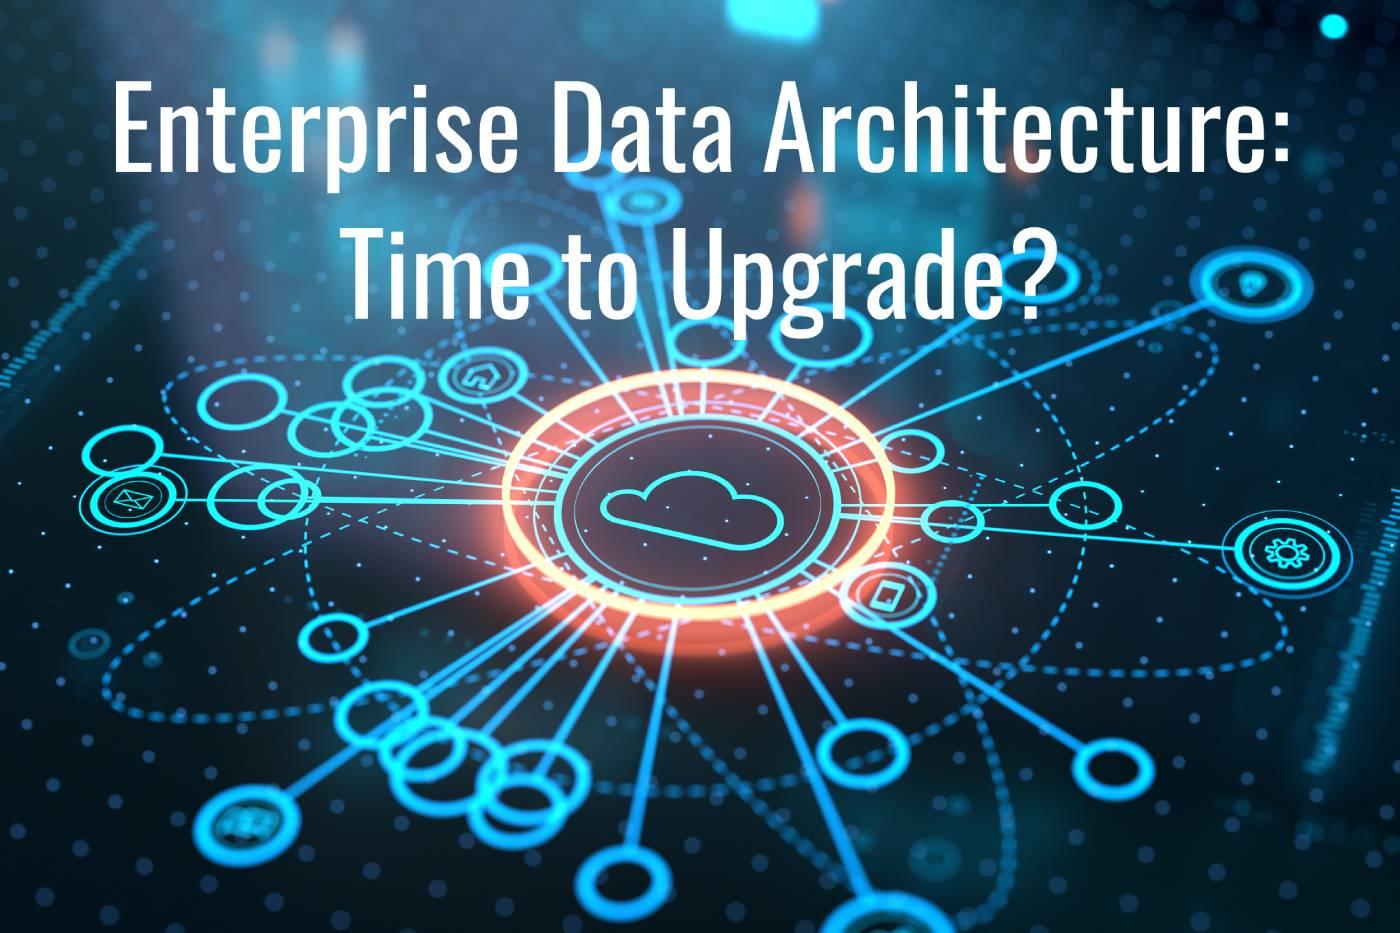 Enterprise Data Architecture: Time to Upgrade?